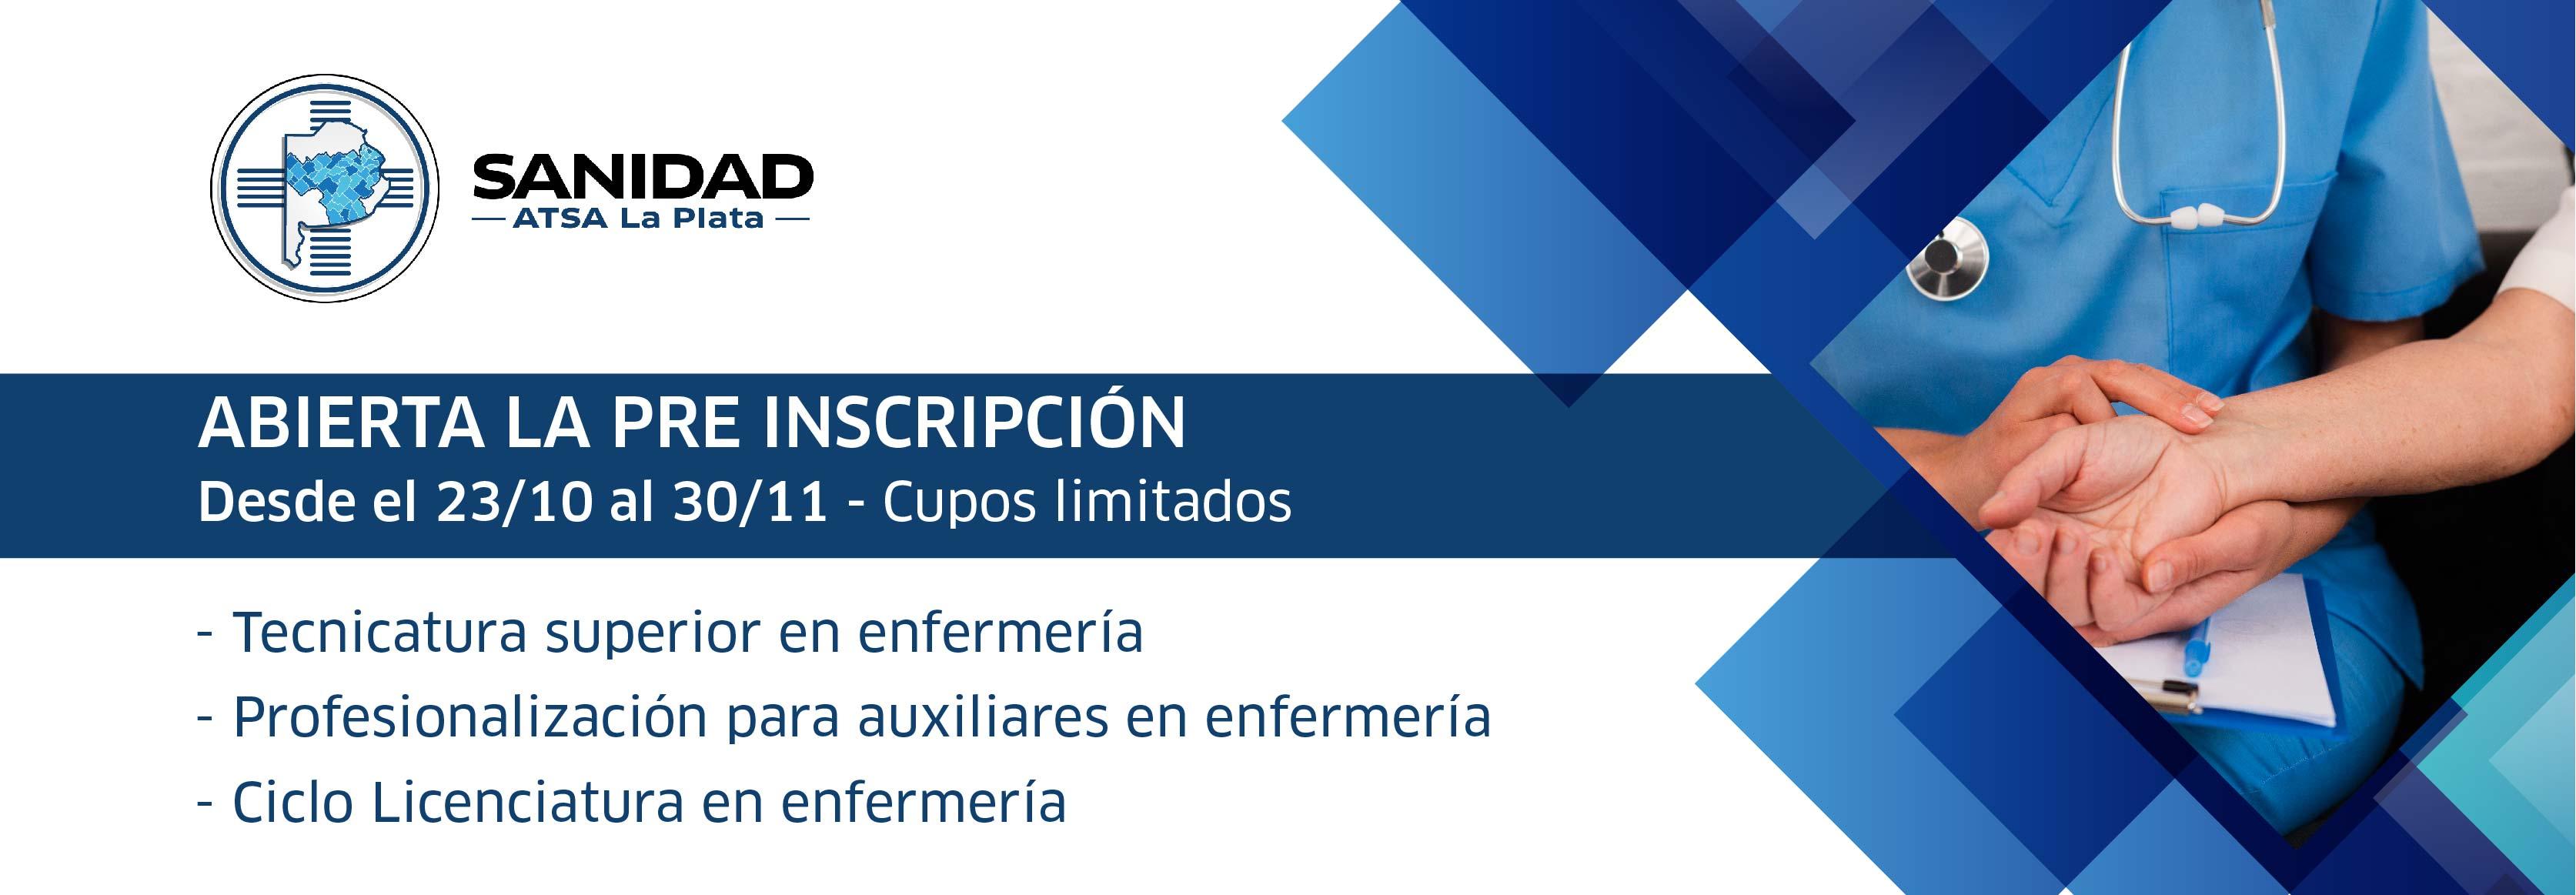 banner-capacitacion-2020-06